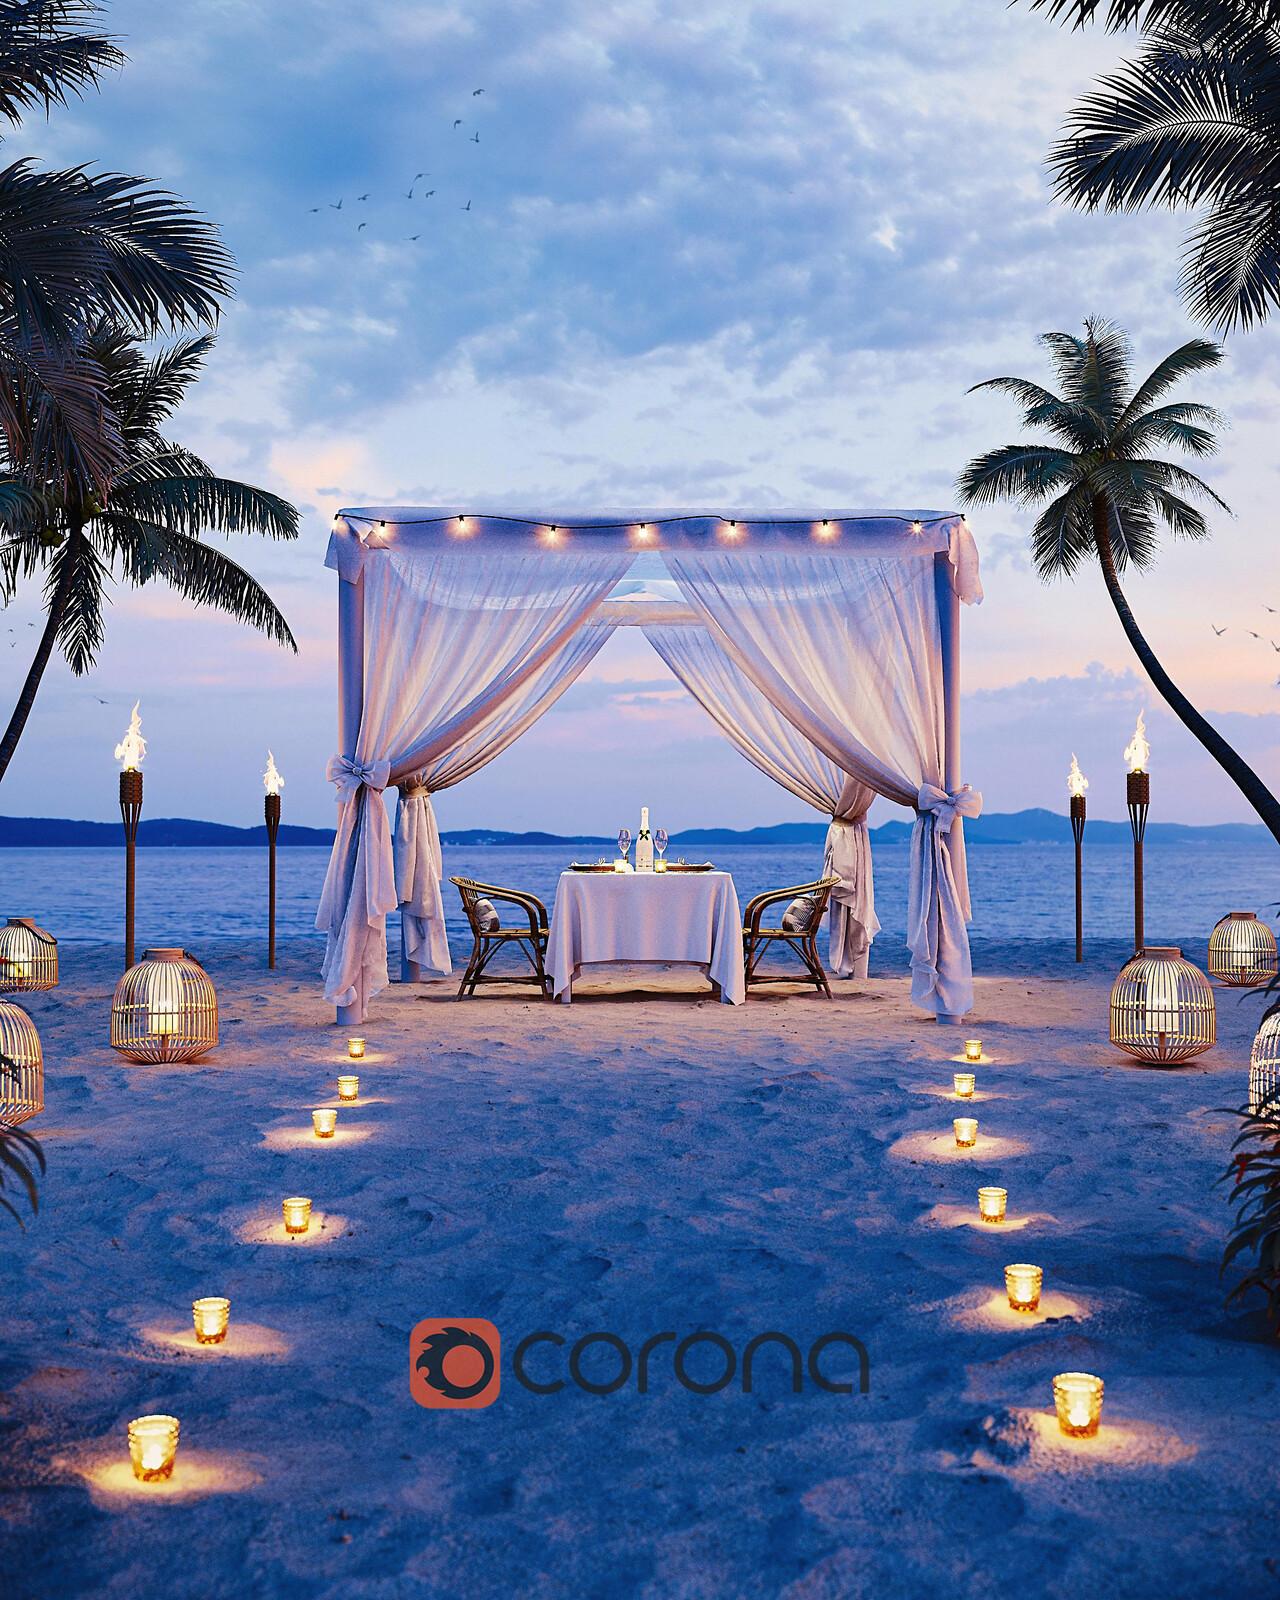 Dinner on the beach - Corona Render